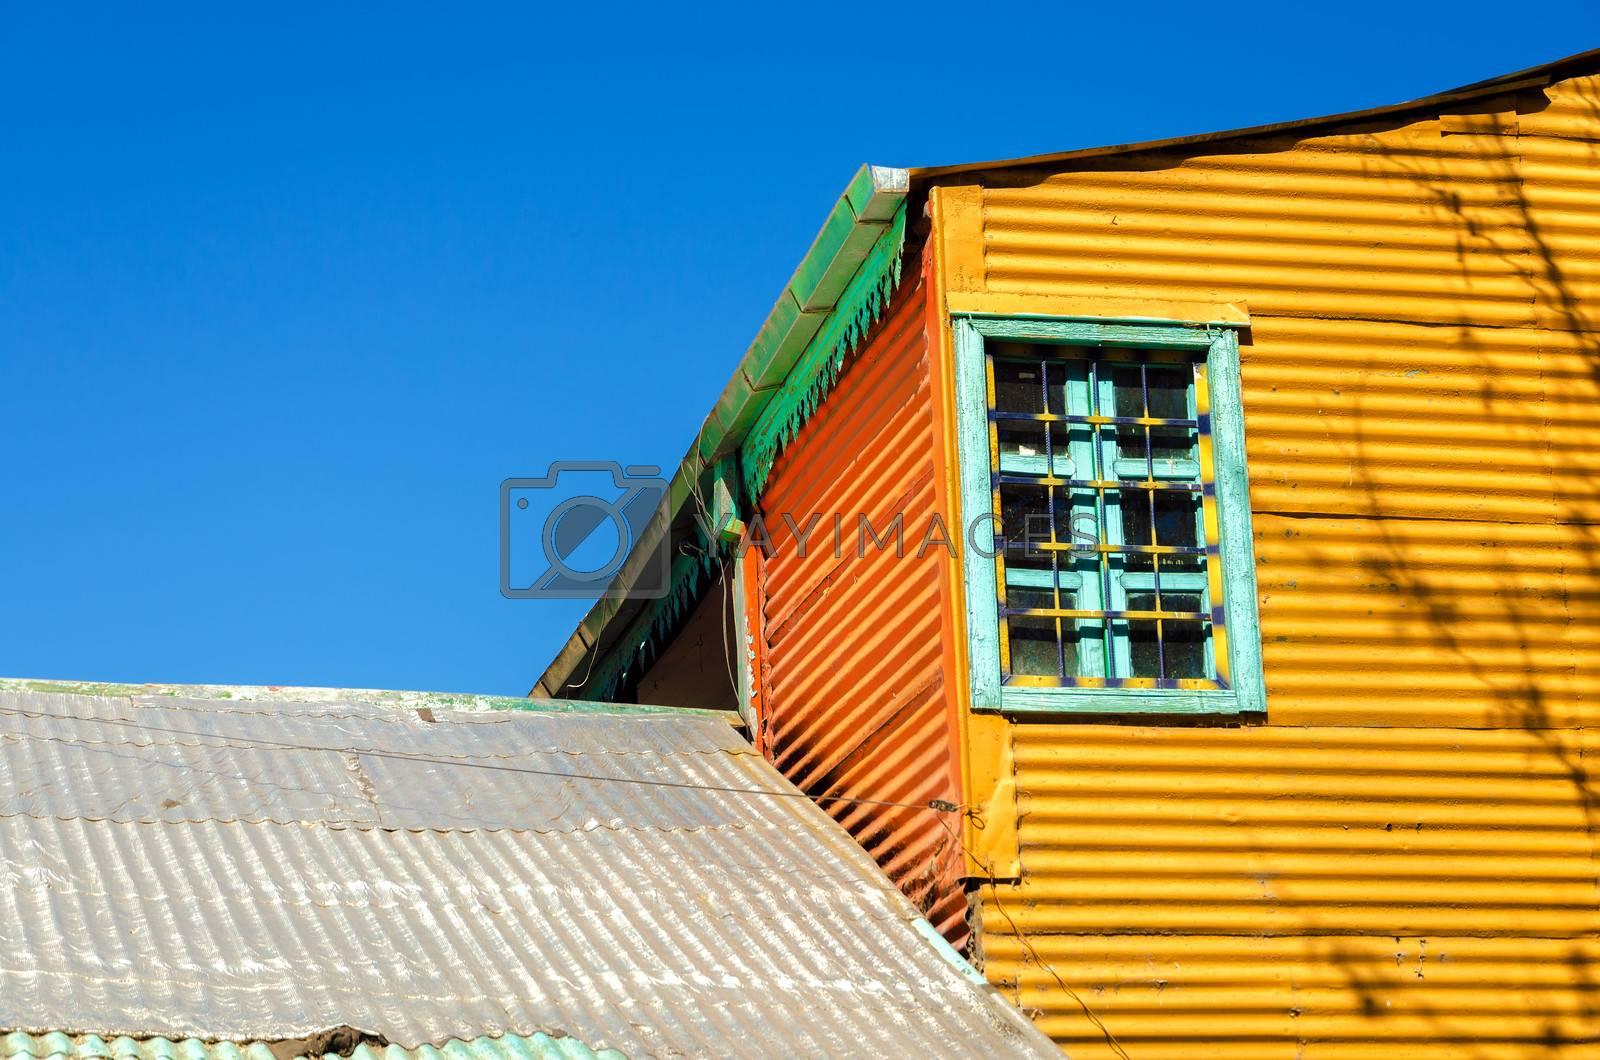 Old orange building set against a blue sky in La Boca neighborhood of Buenos Aires